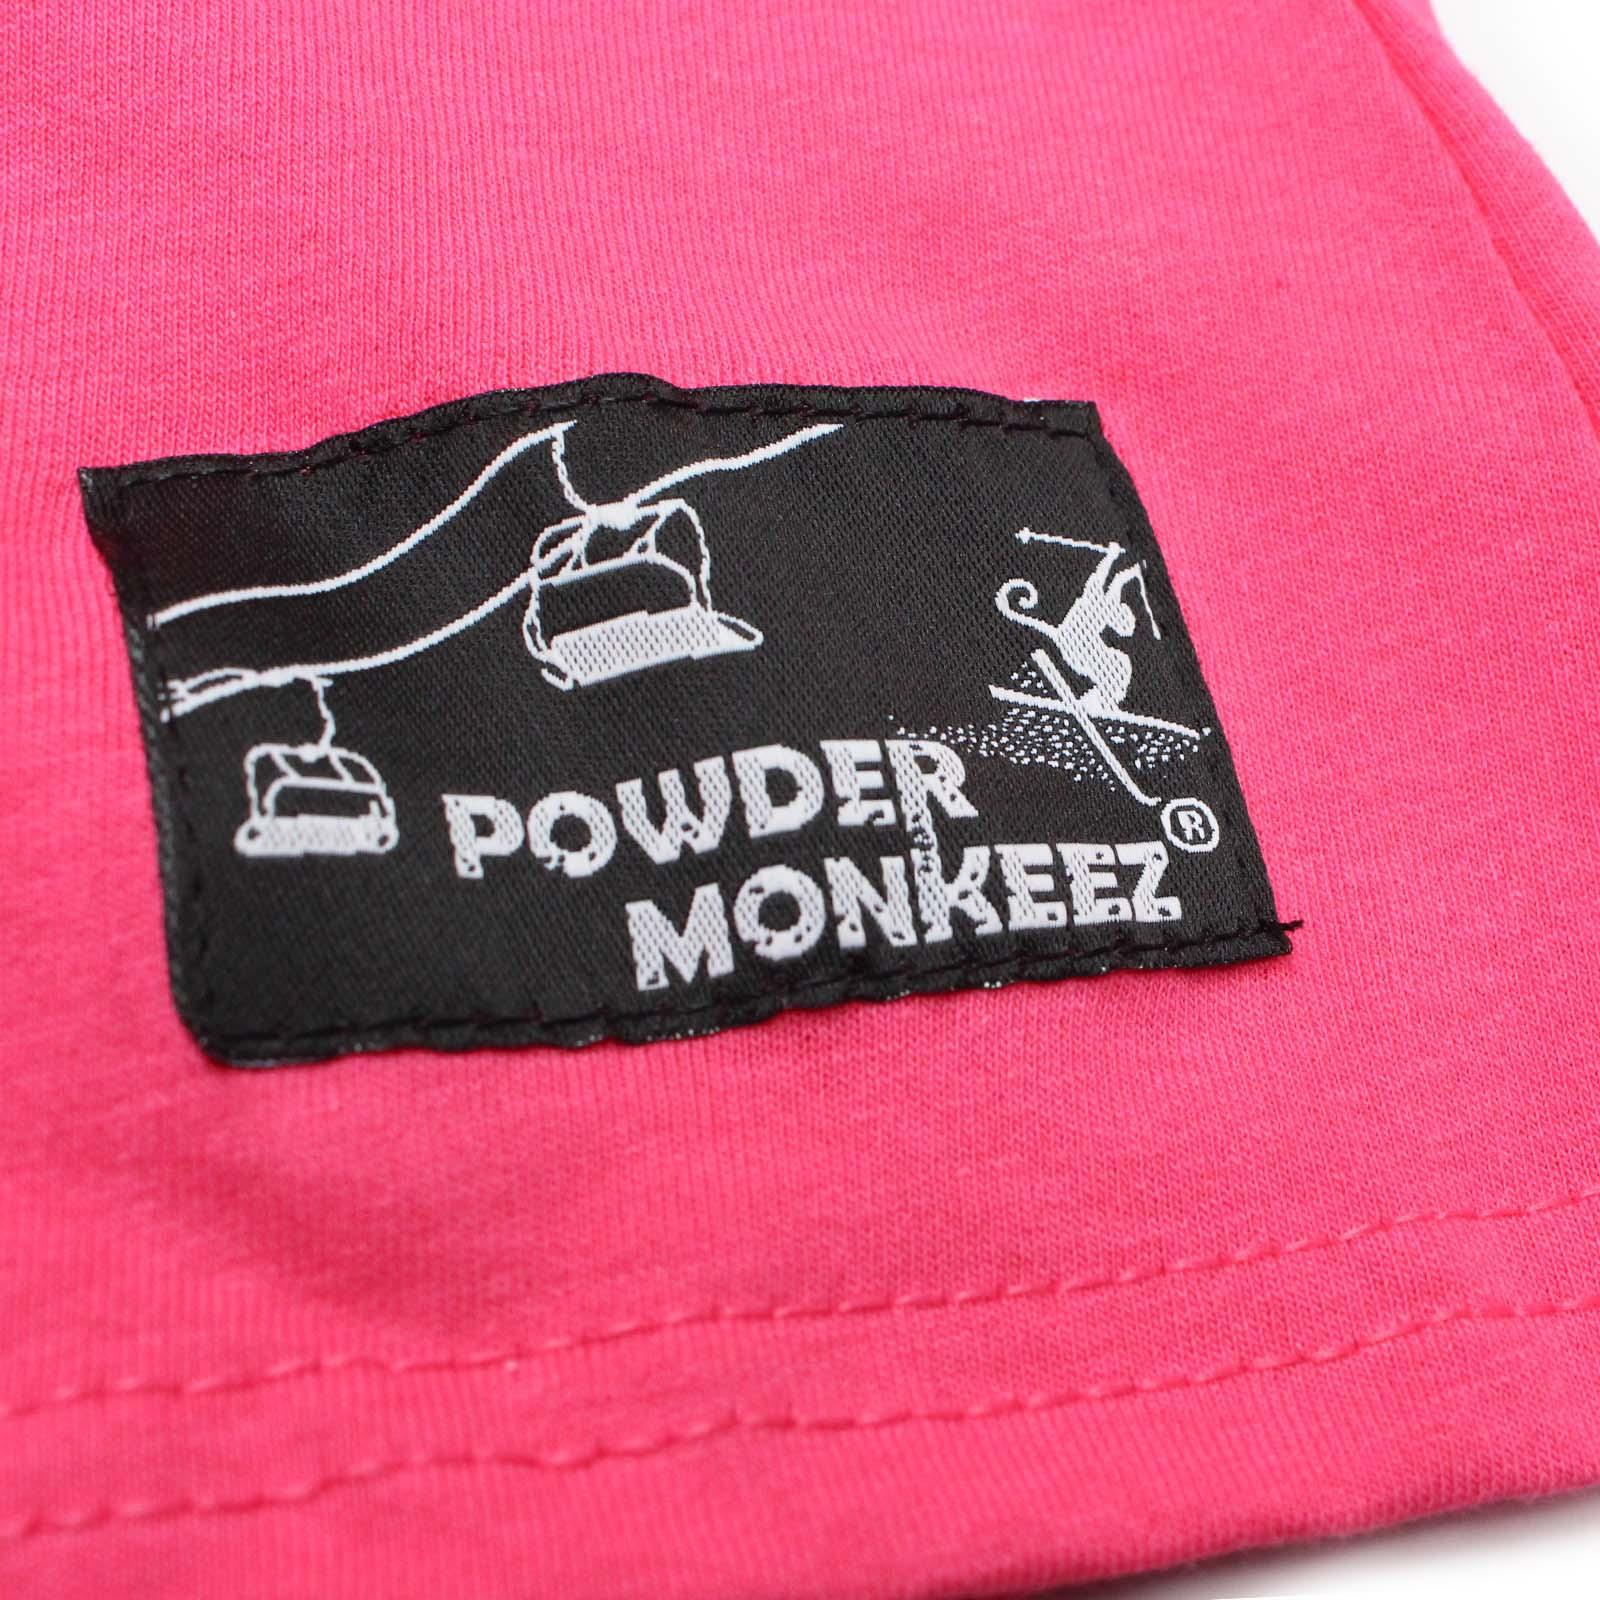 Skiing-Ski-Tops-T-Shirt-Funny-Novelty-Womens-tee-Ski-I-Ski-Like-A-Gir thumbnail 17